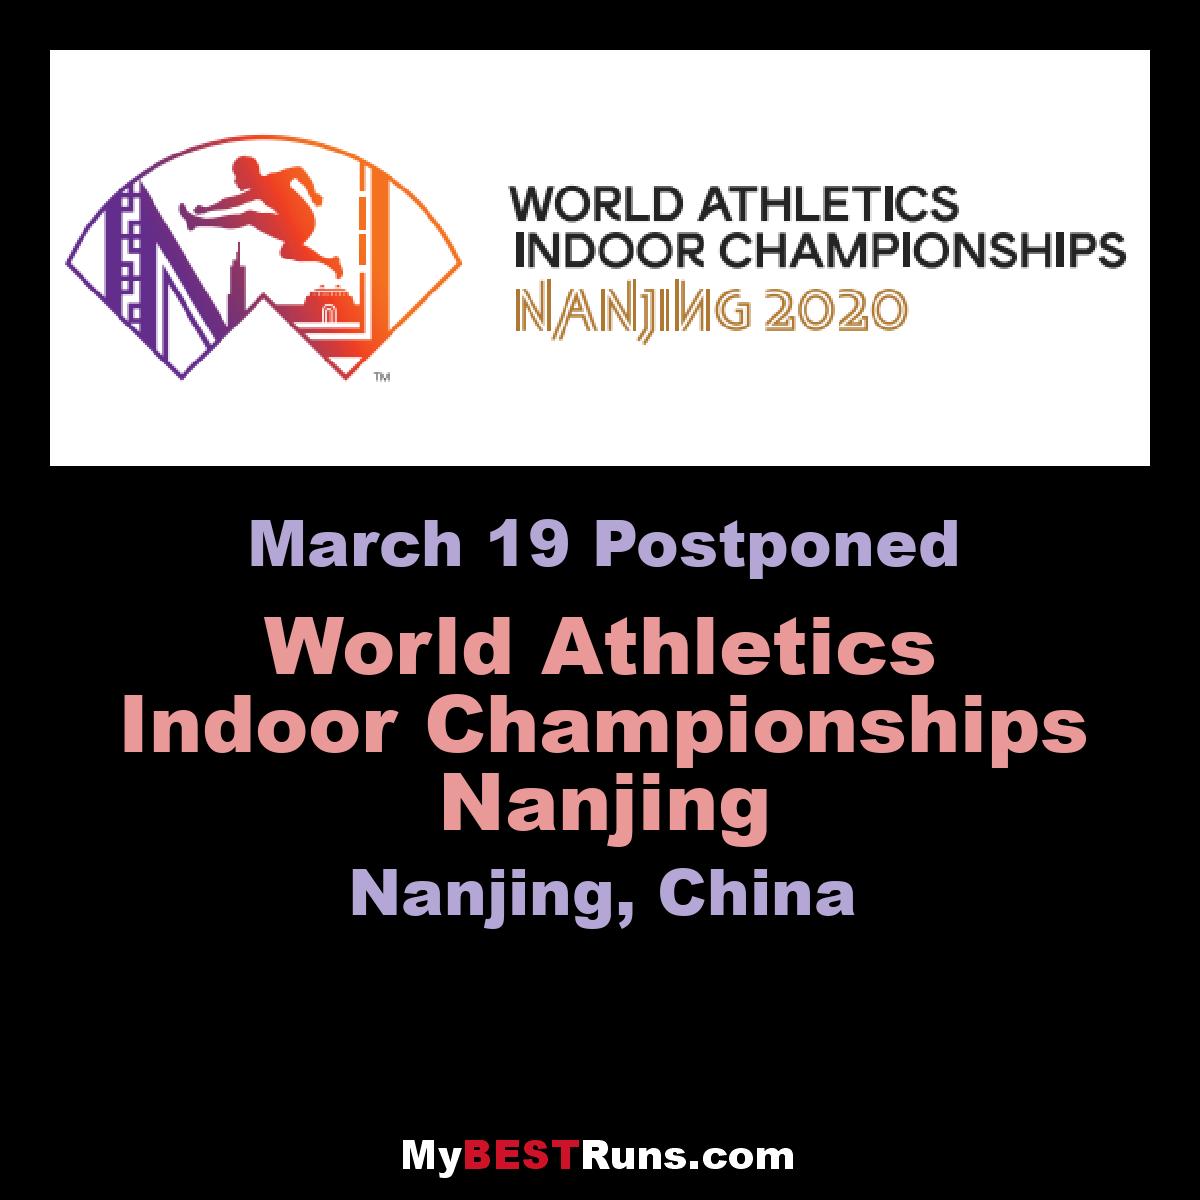 World Athletics Indoor Championships Nanjing